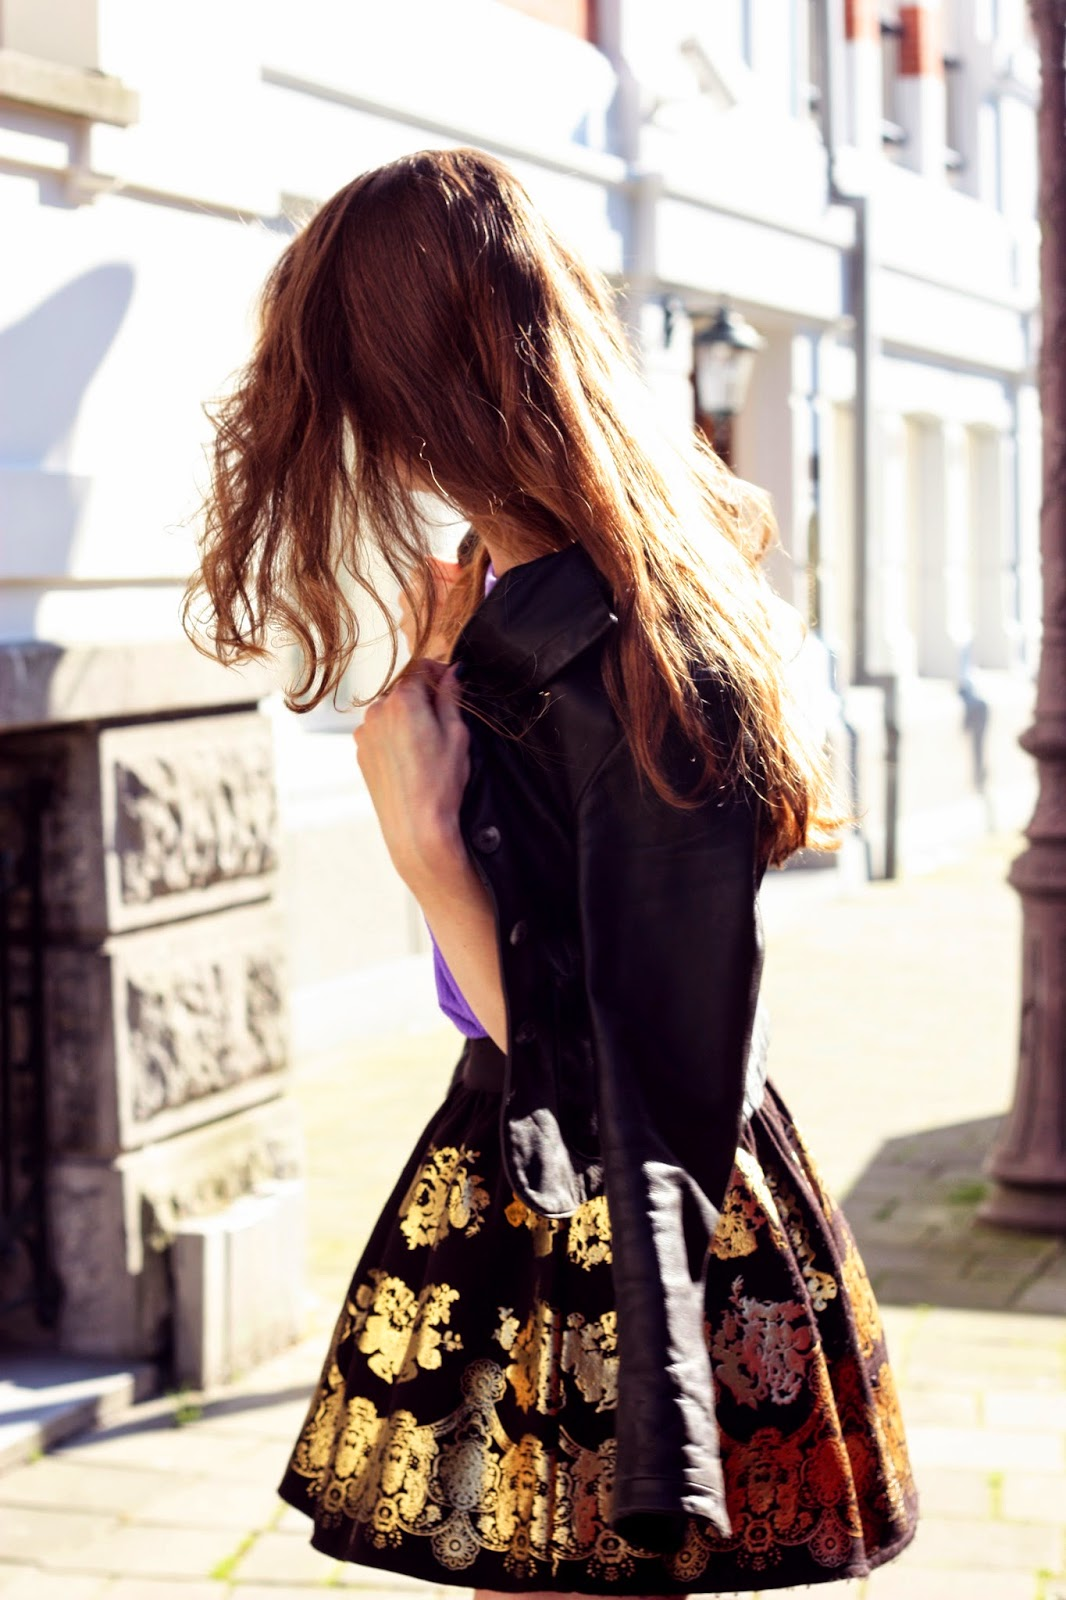 Dolce&Gabbana x ELLE